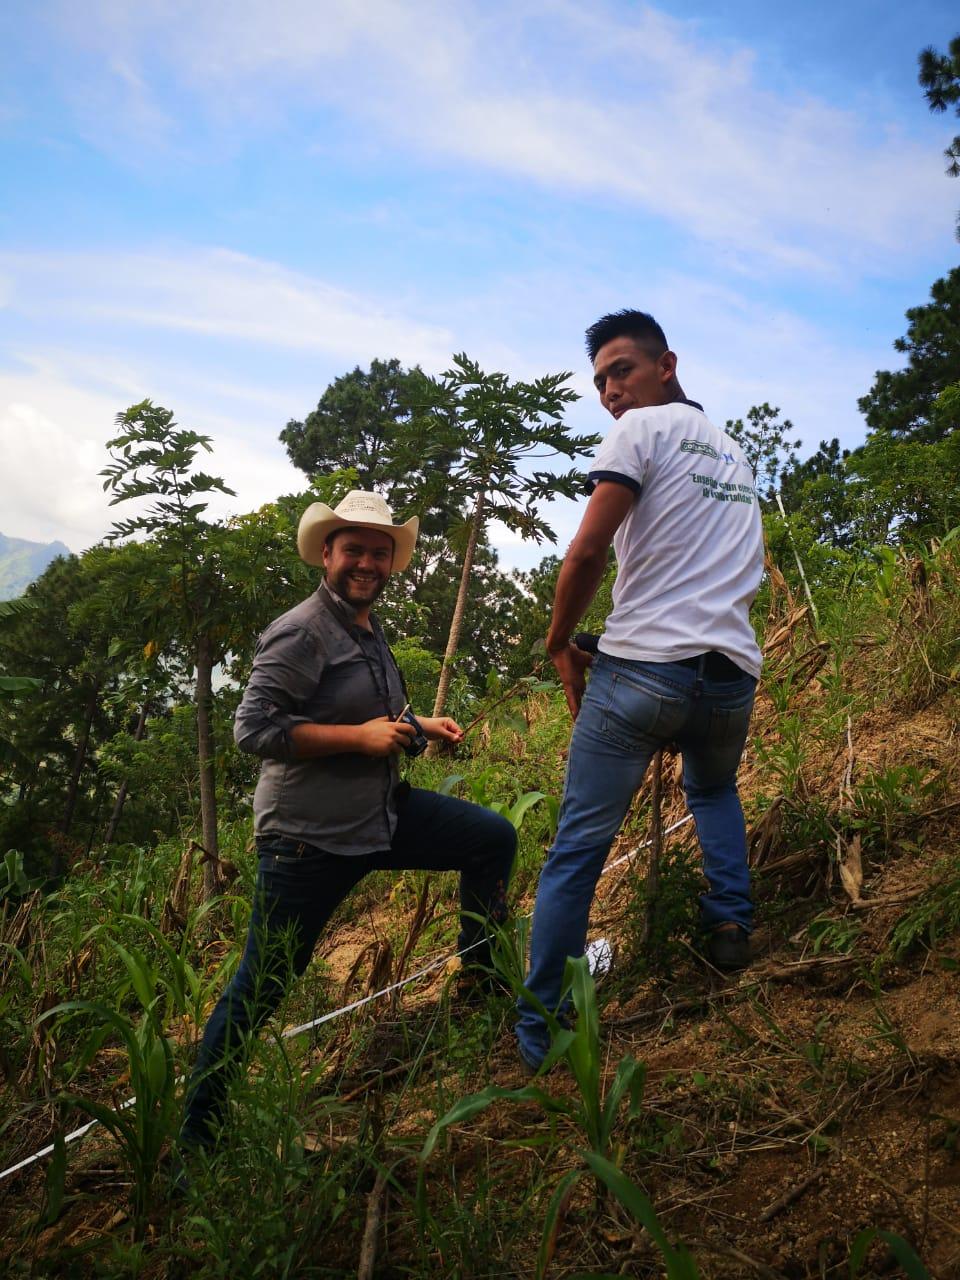 guatemala missione mani tese 2019 (3)